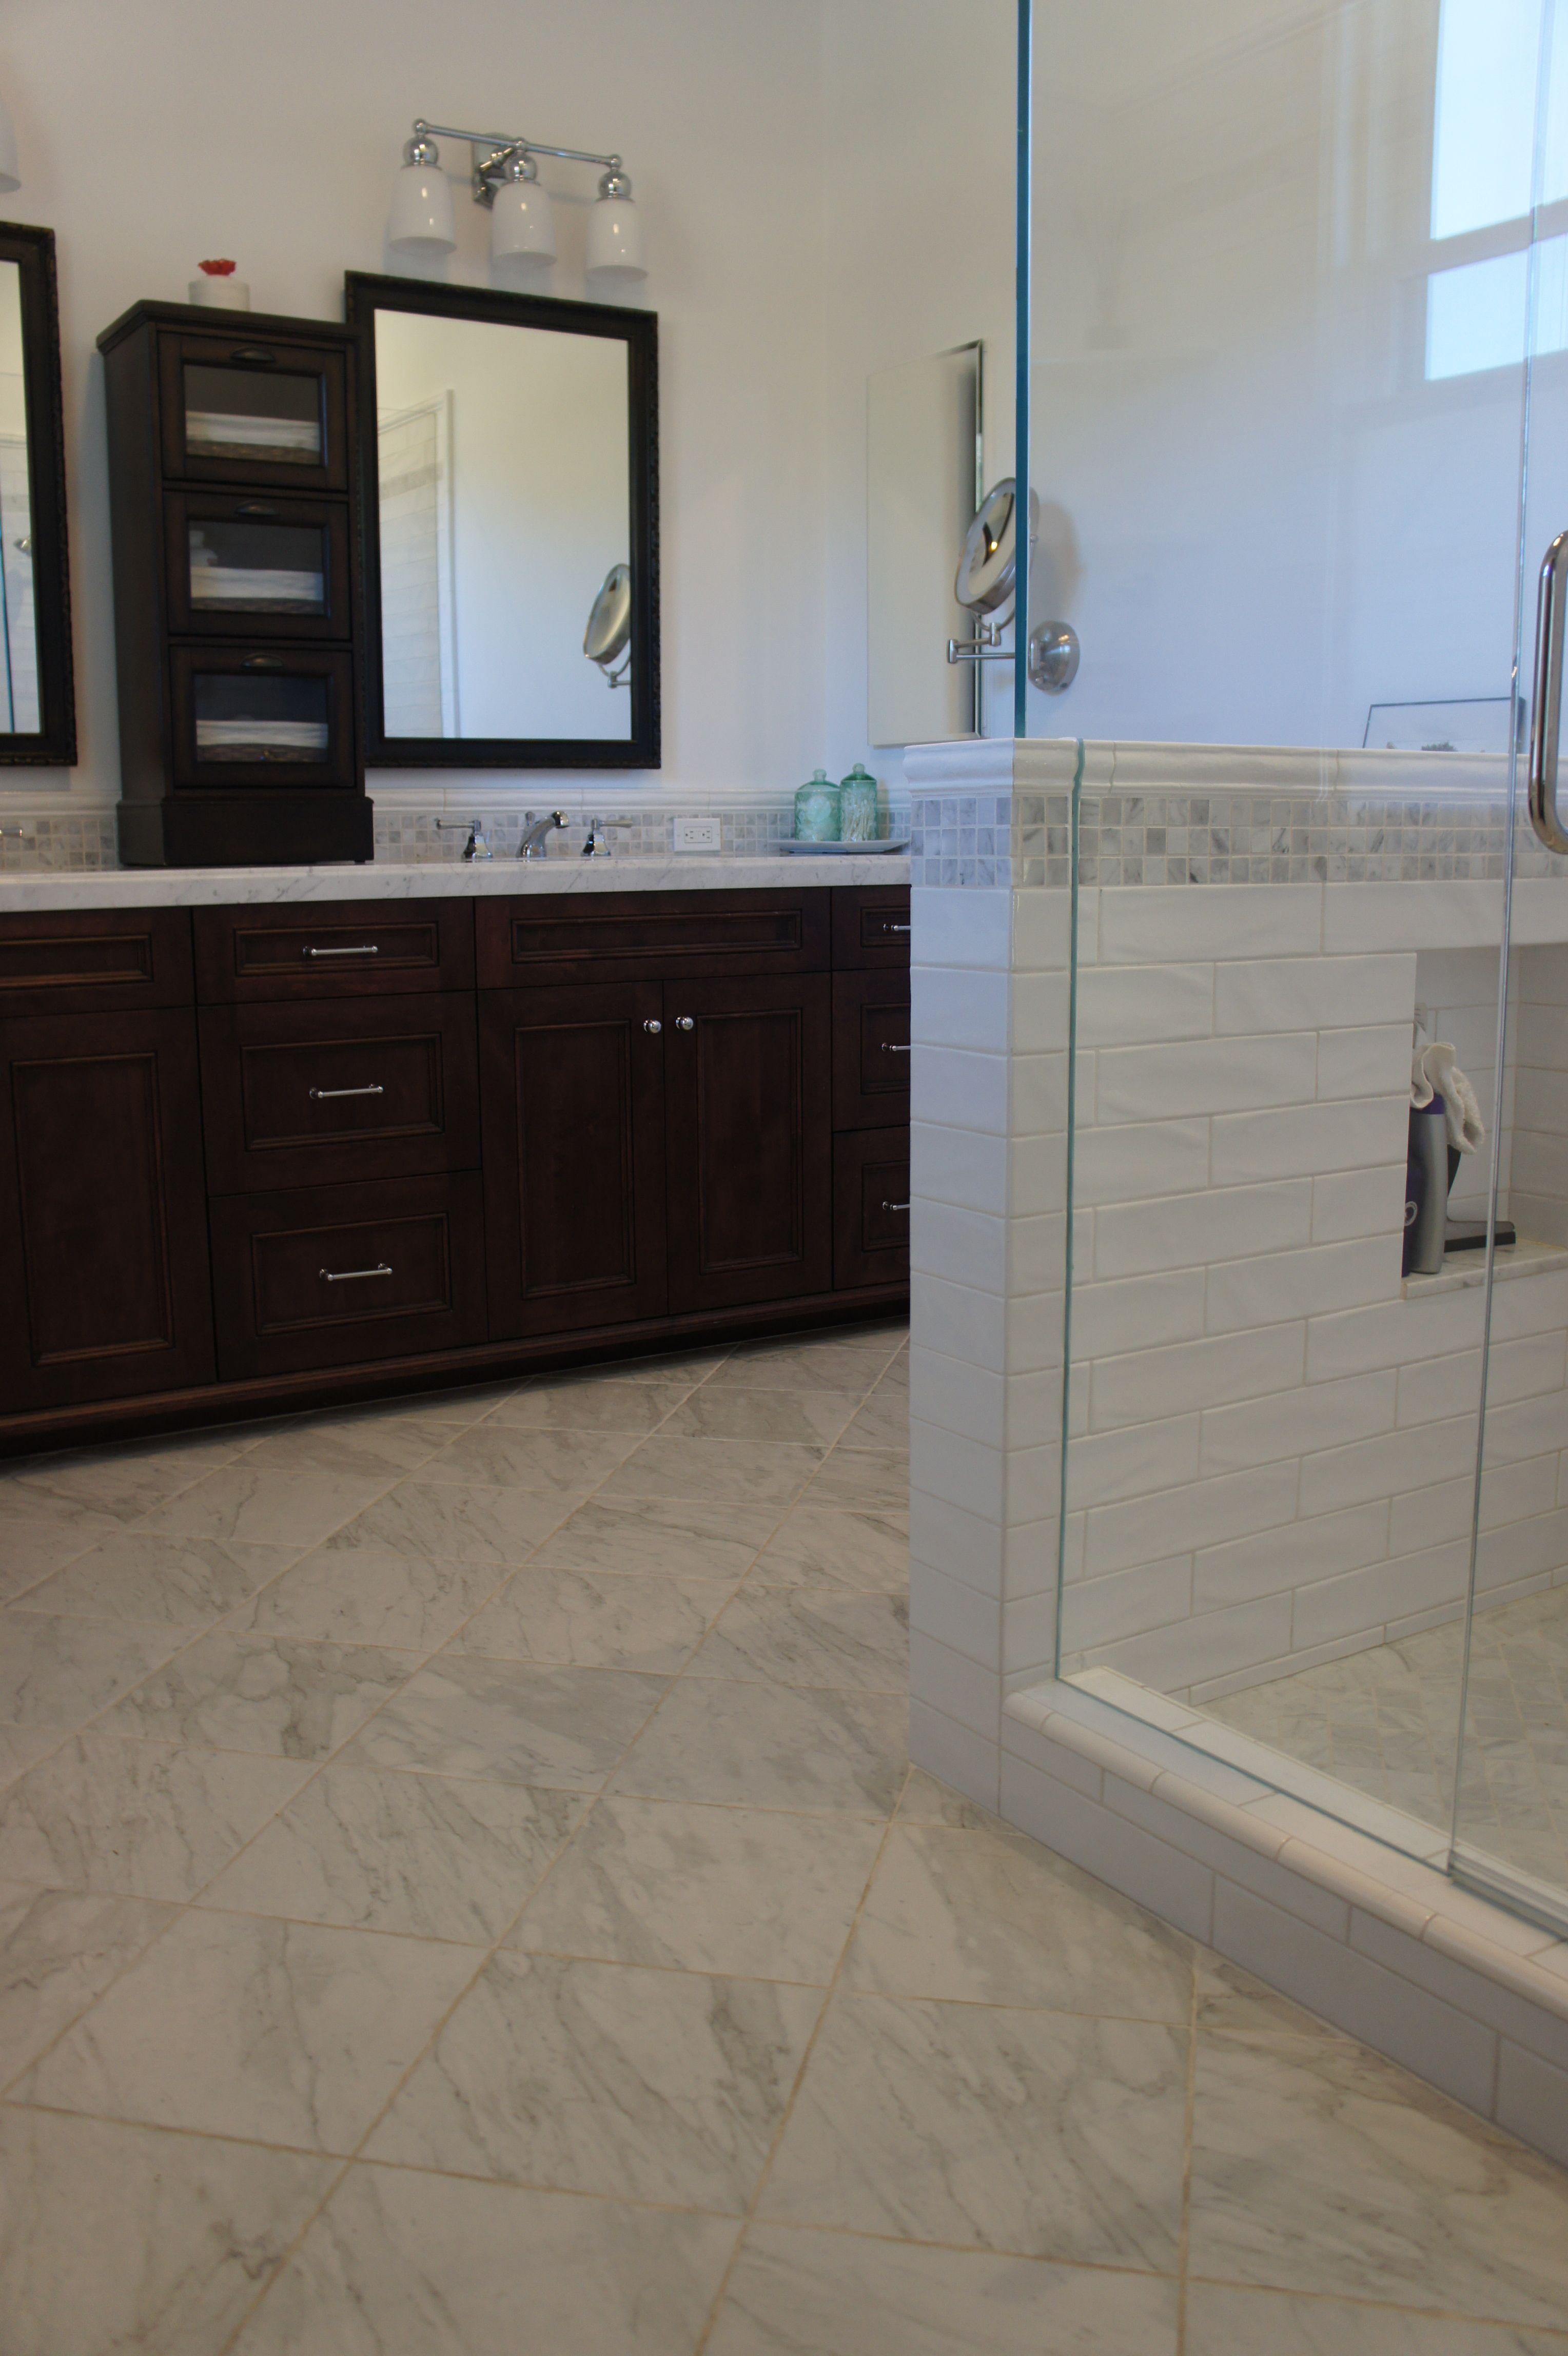 White Subway Tile And Carrara Marble Bathroom Carrara Marble Bathroom Marble Bathroom White Subway Tile